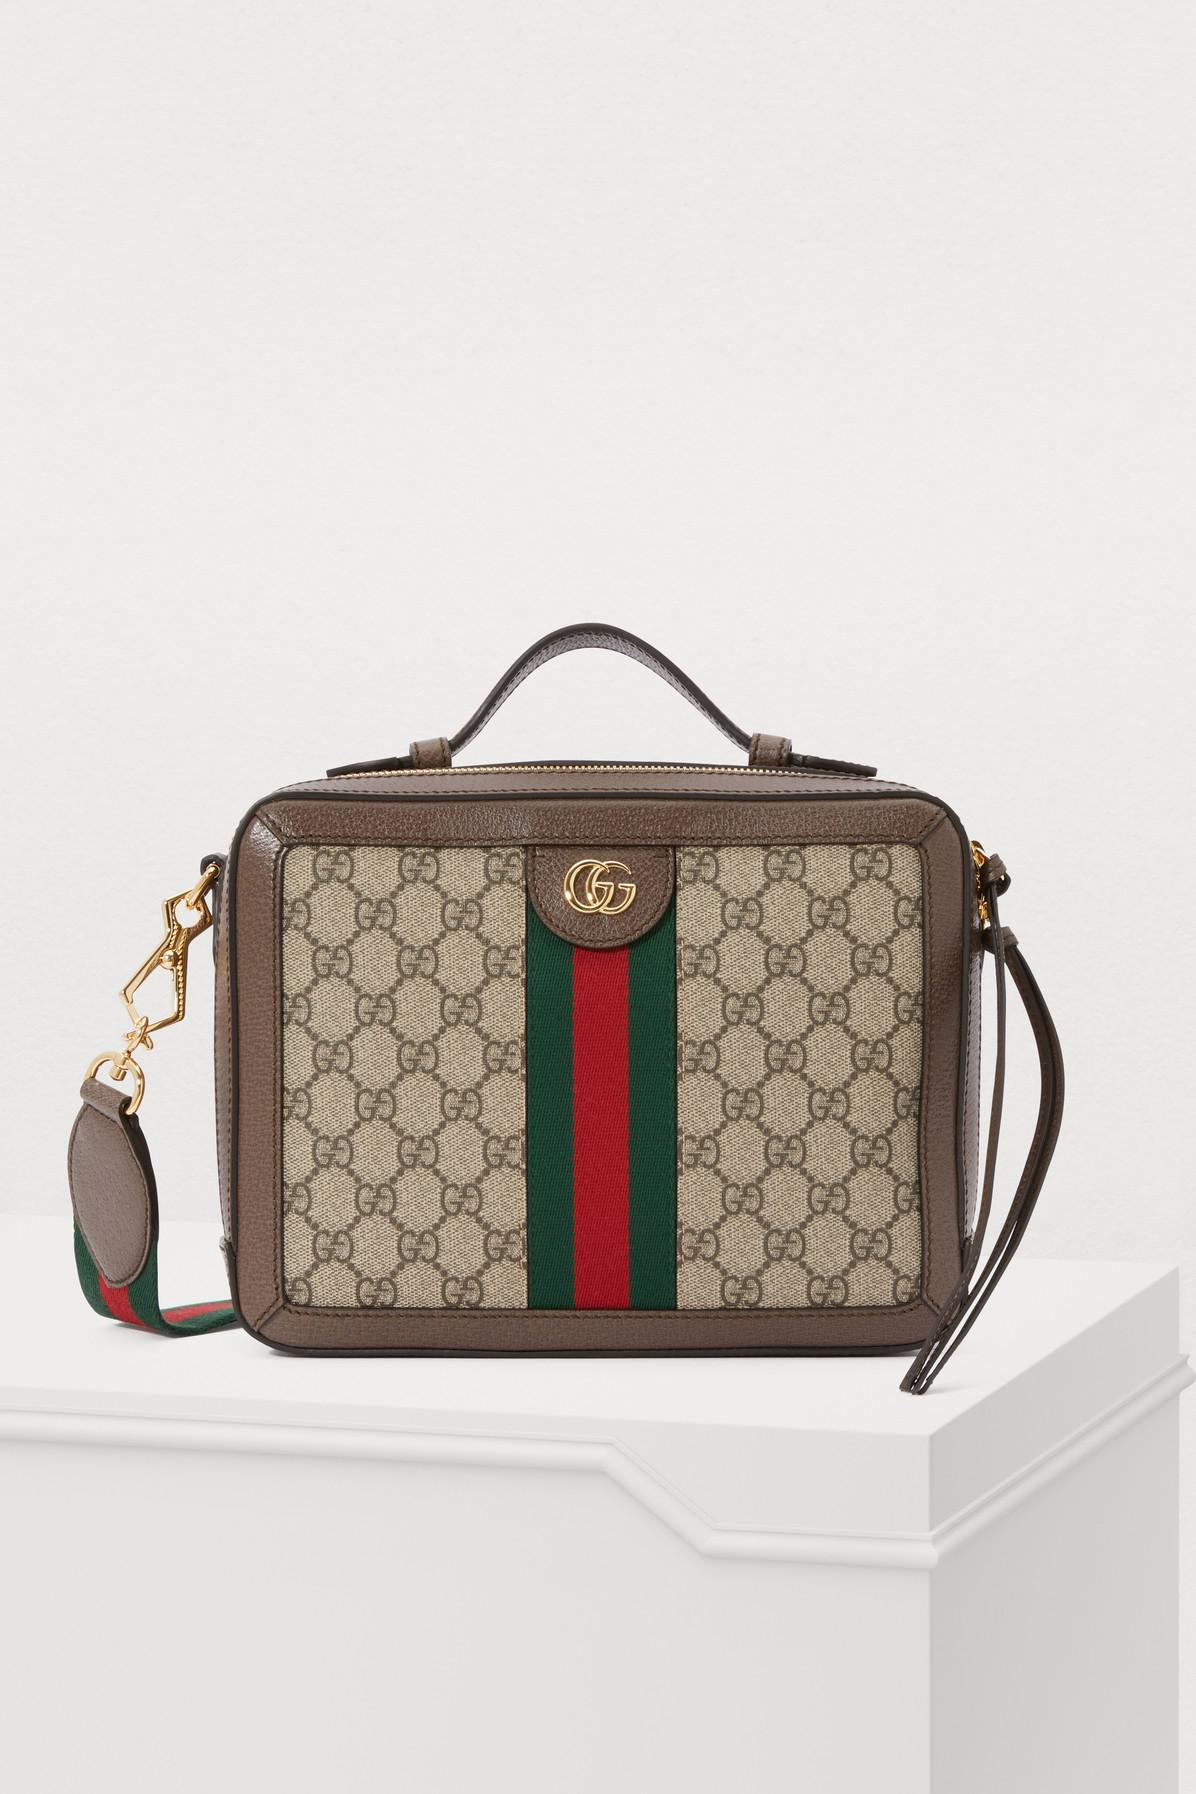 0c00cd43ade Lyst - Gucci Ophidia Shoulder Bag in Natural